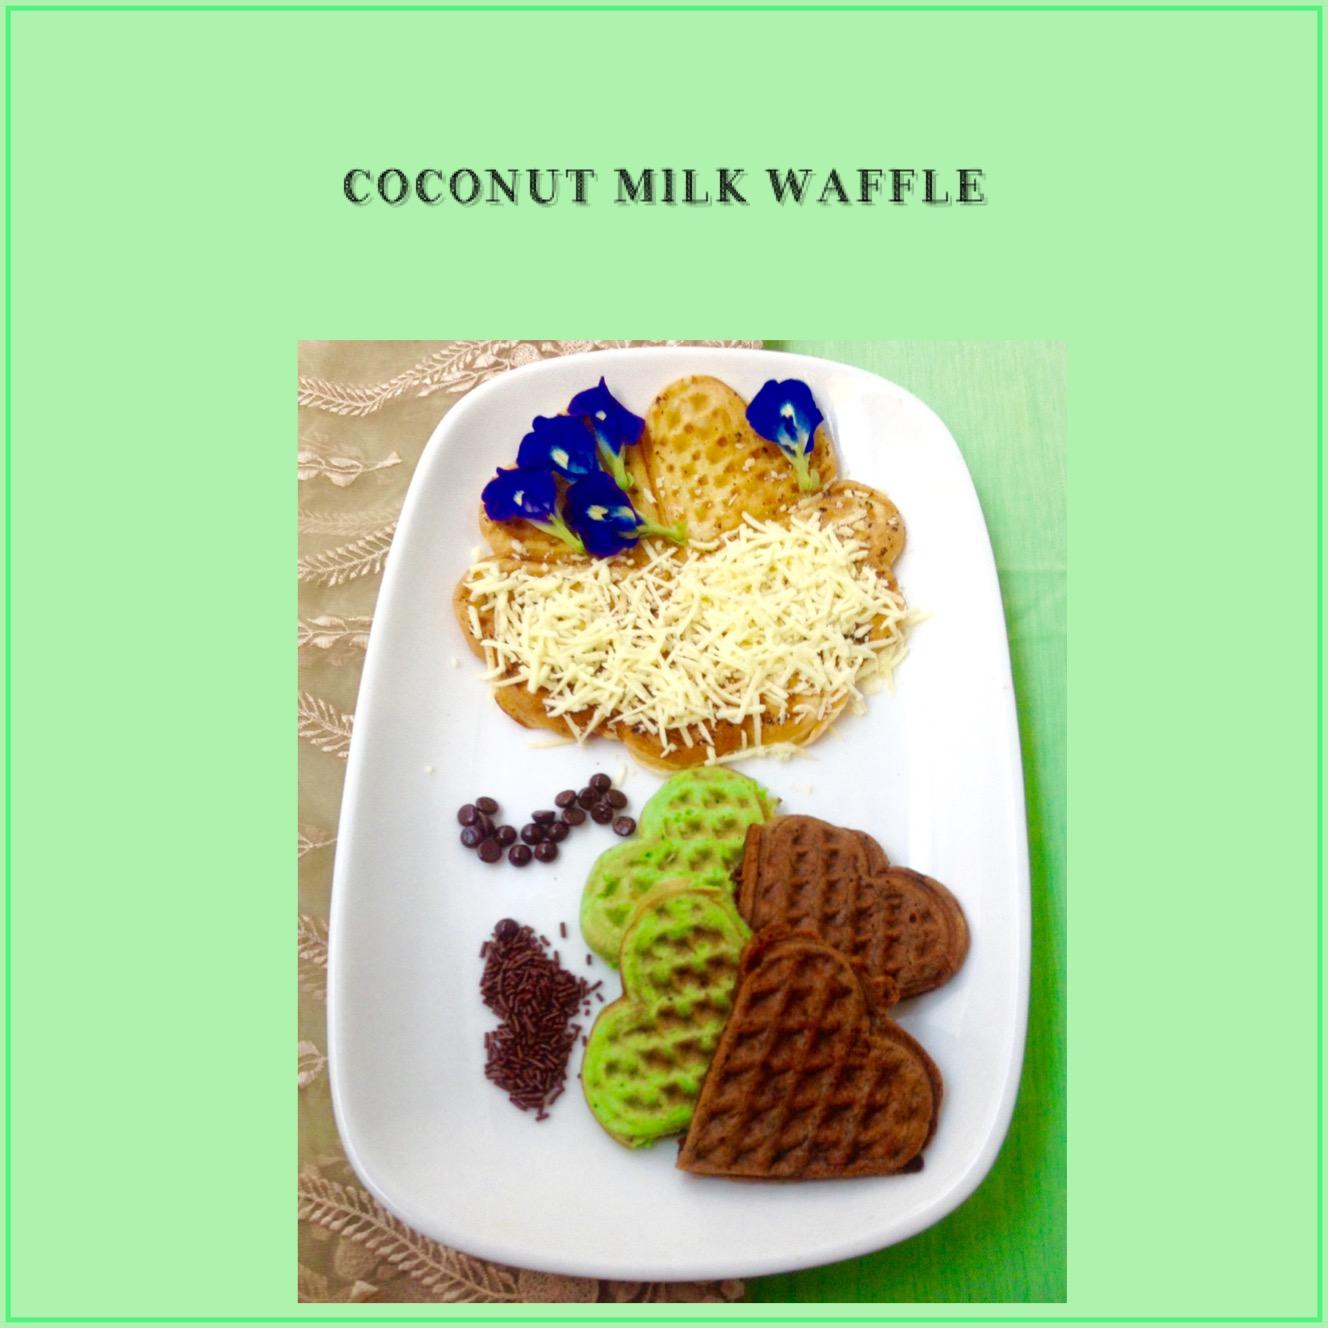 Resep Coconut Milk Waffle